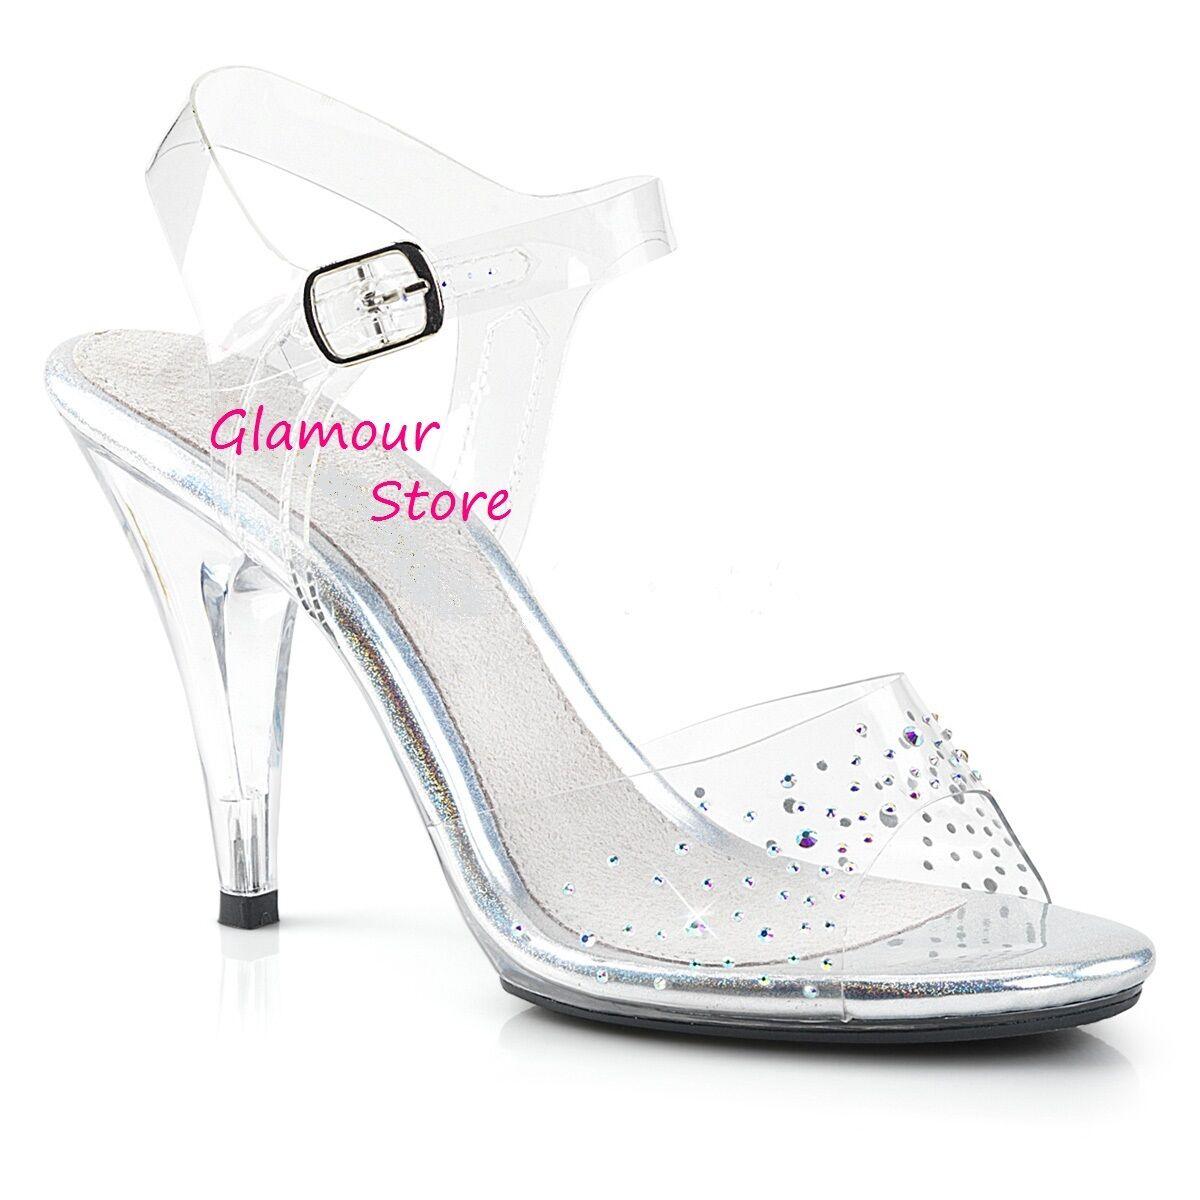 Sexy SANDALI STRASS TRASPARENTI tacco 10 dal 35 al 43 chaussures GLAMOUR fashion